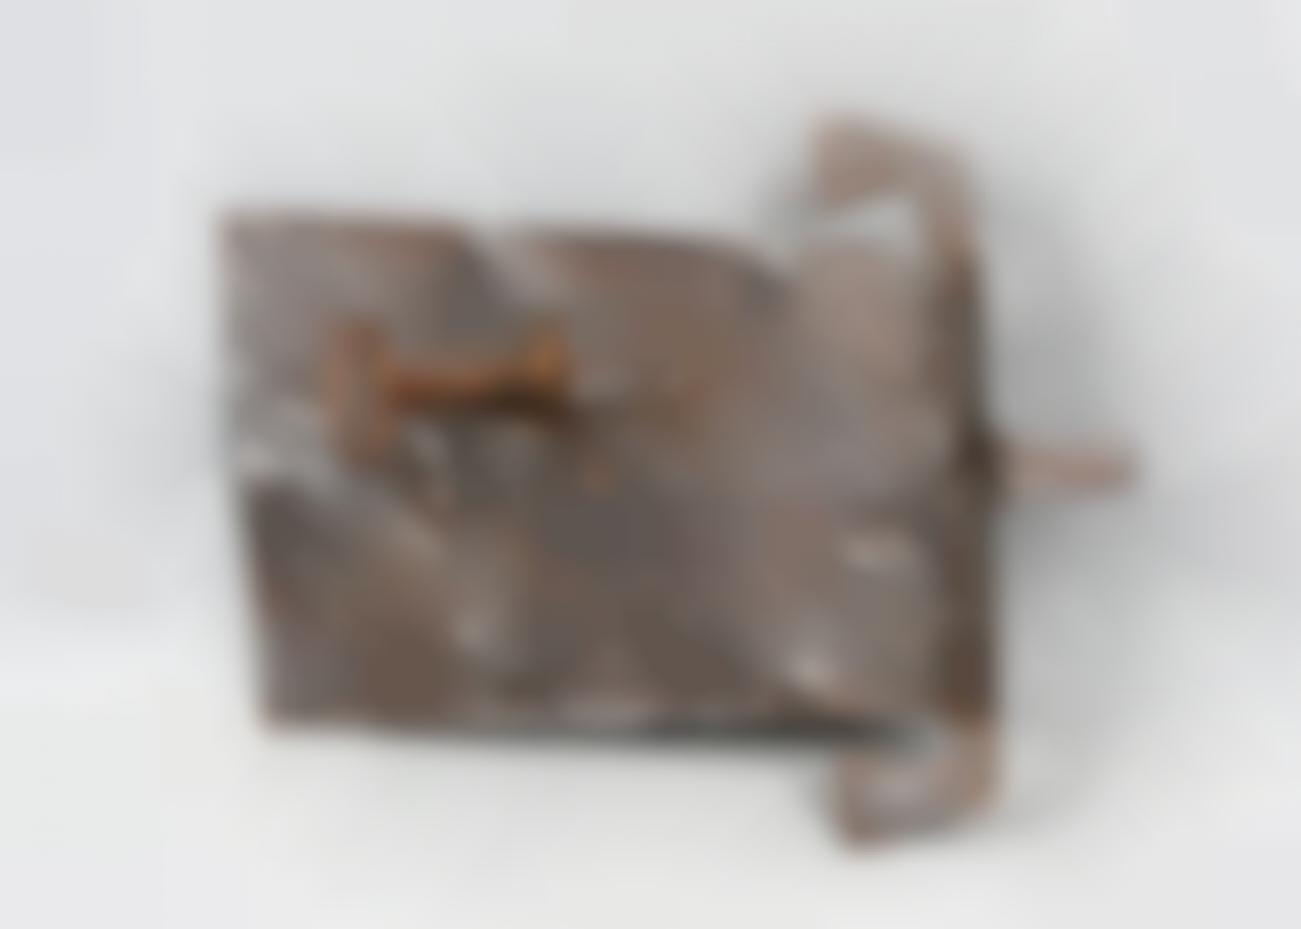 An Antique German Iron Door Lock And Key-